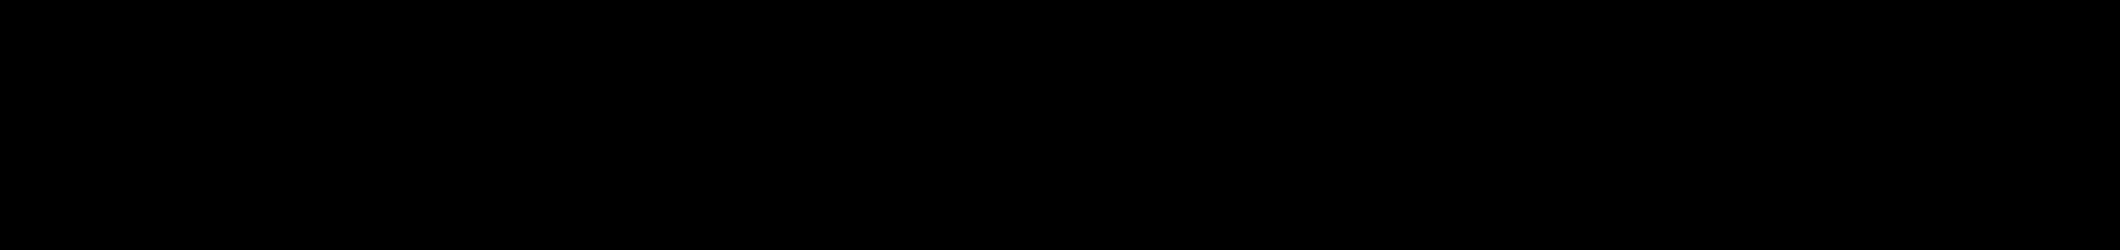 CYMBACAVUM